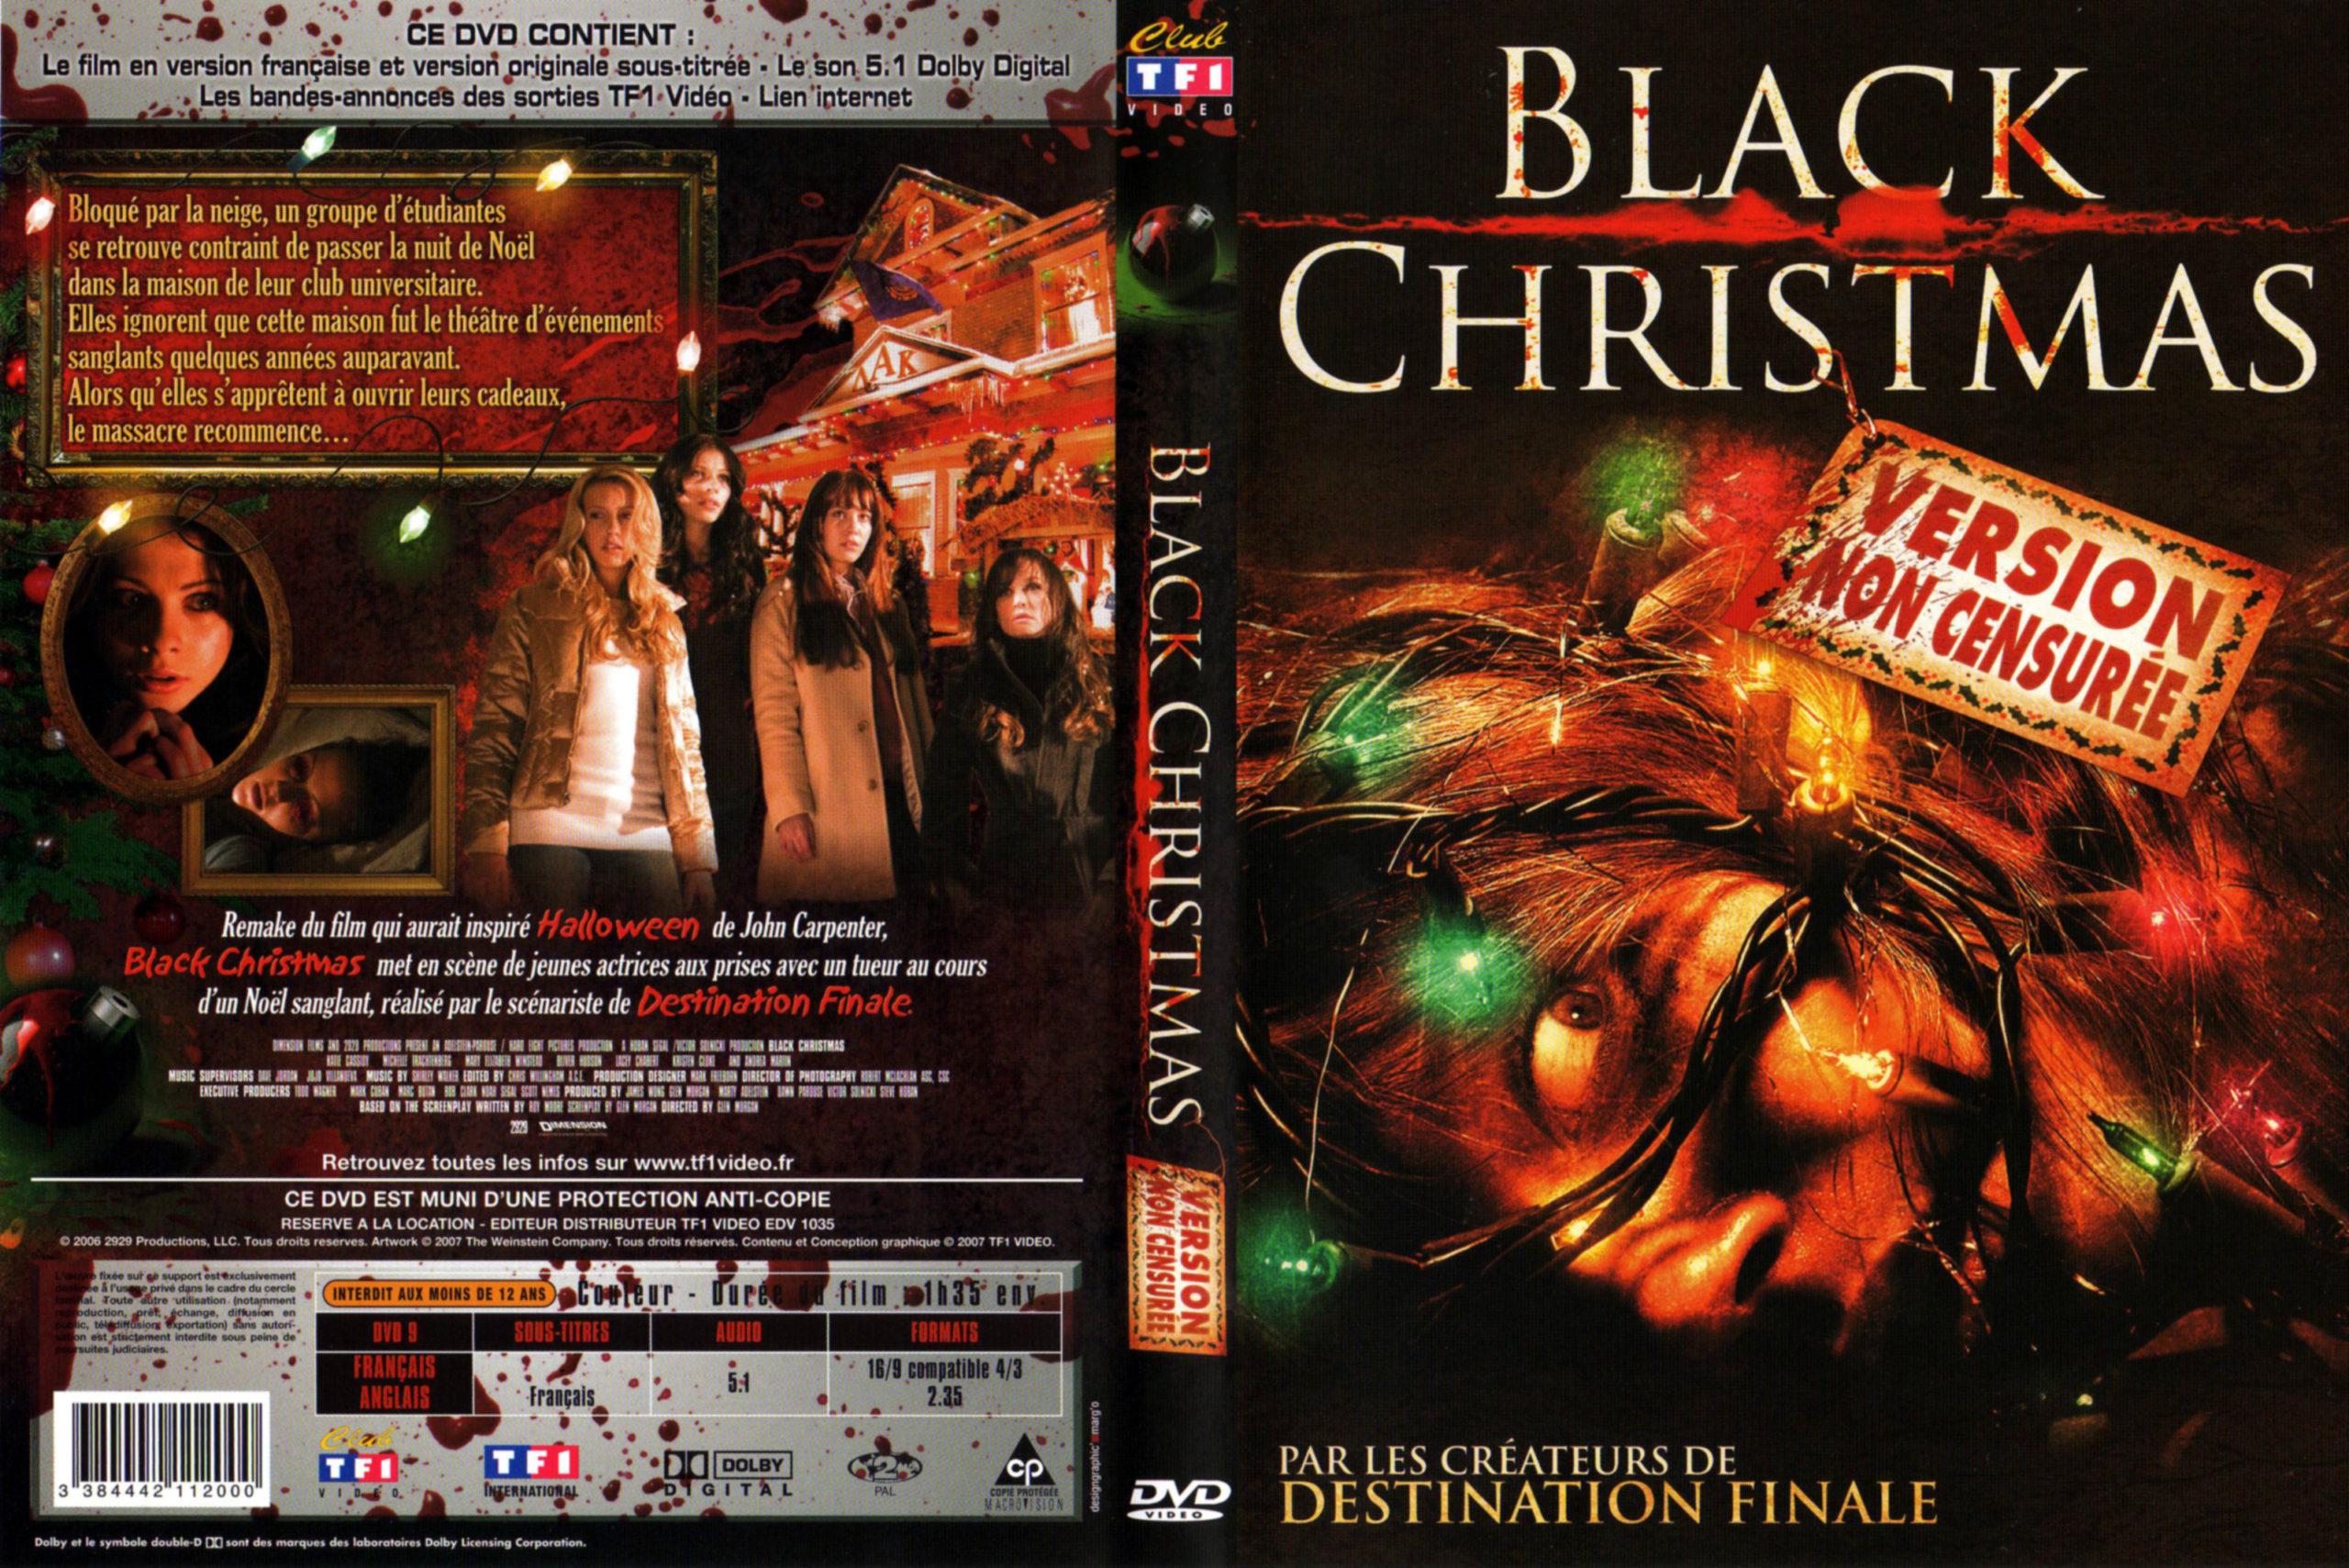 Black Christmas de Sophia Takal